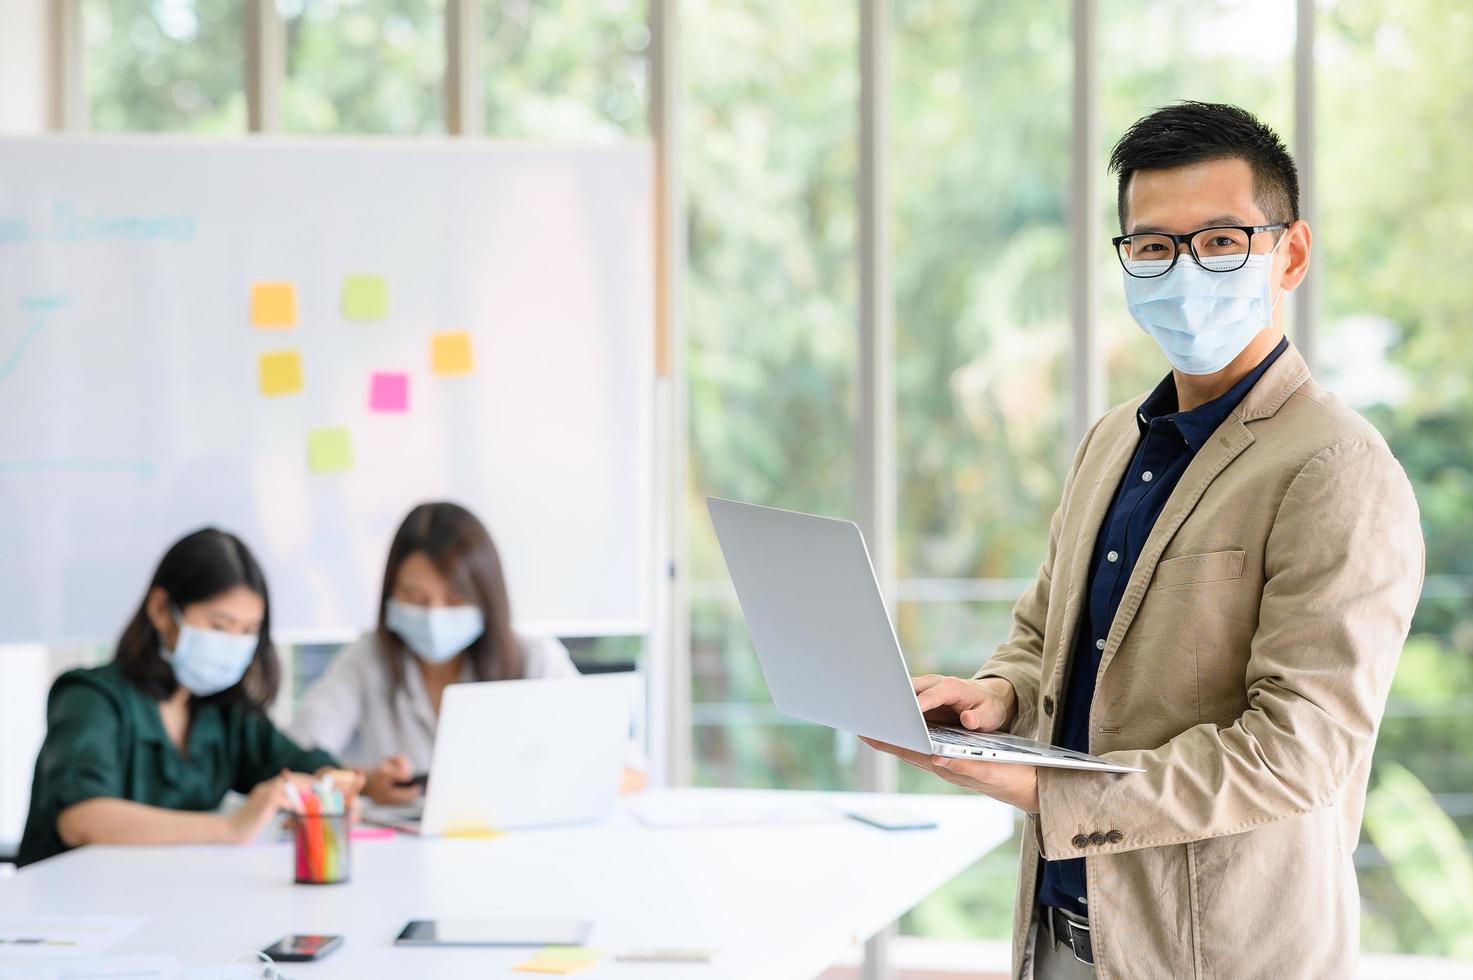 zakenman draagt gezichtsmasker op kantoor foto